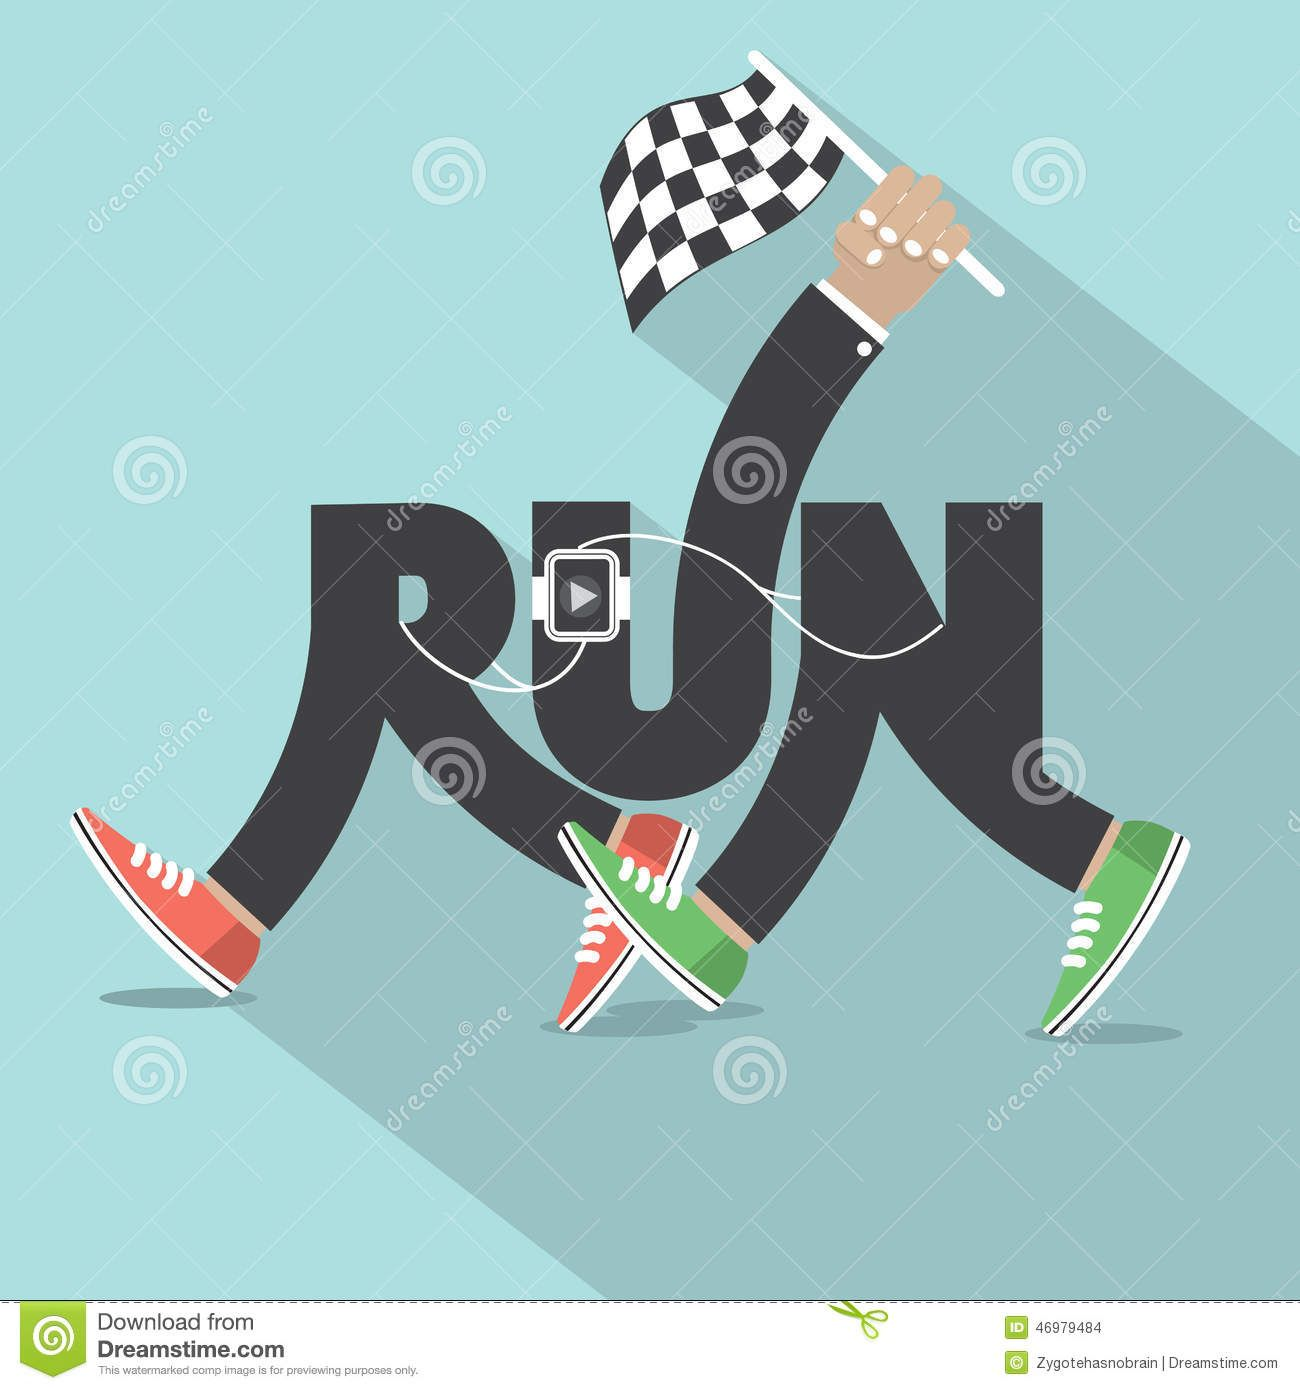 Run Event Typography - Pesquisa Google Graphic